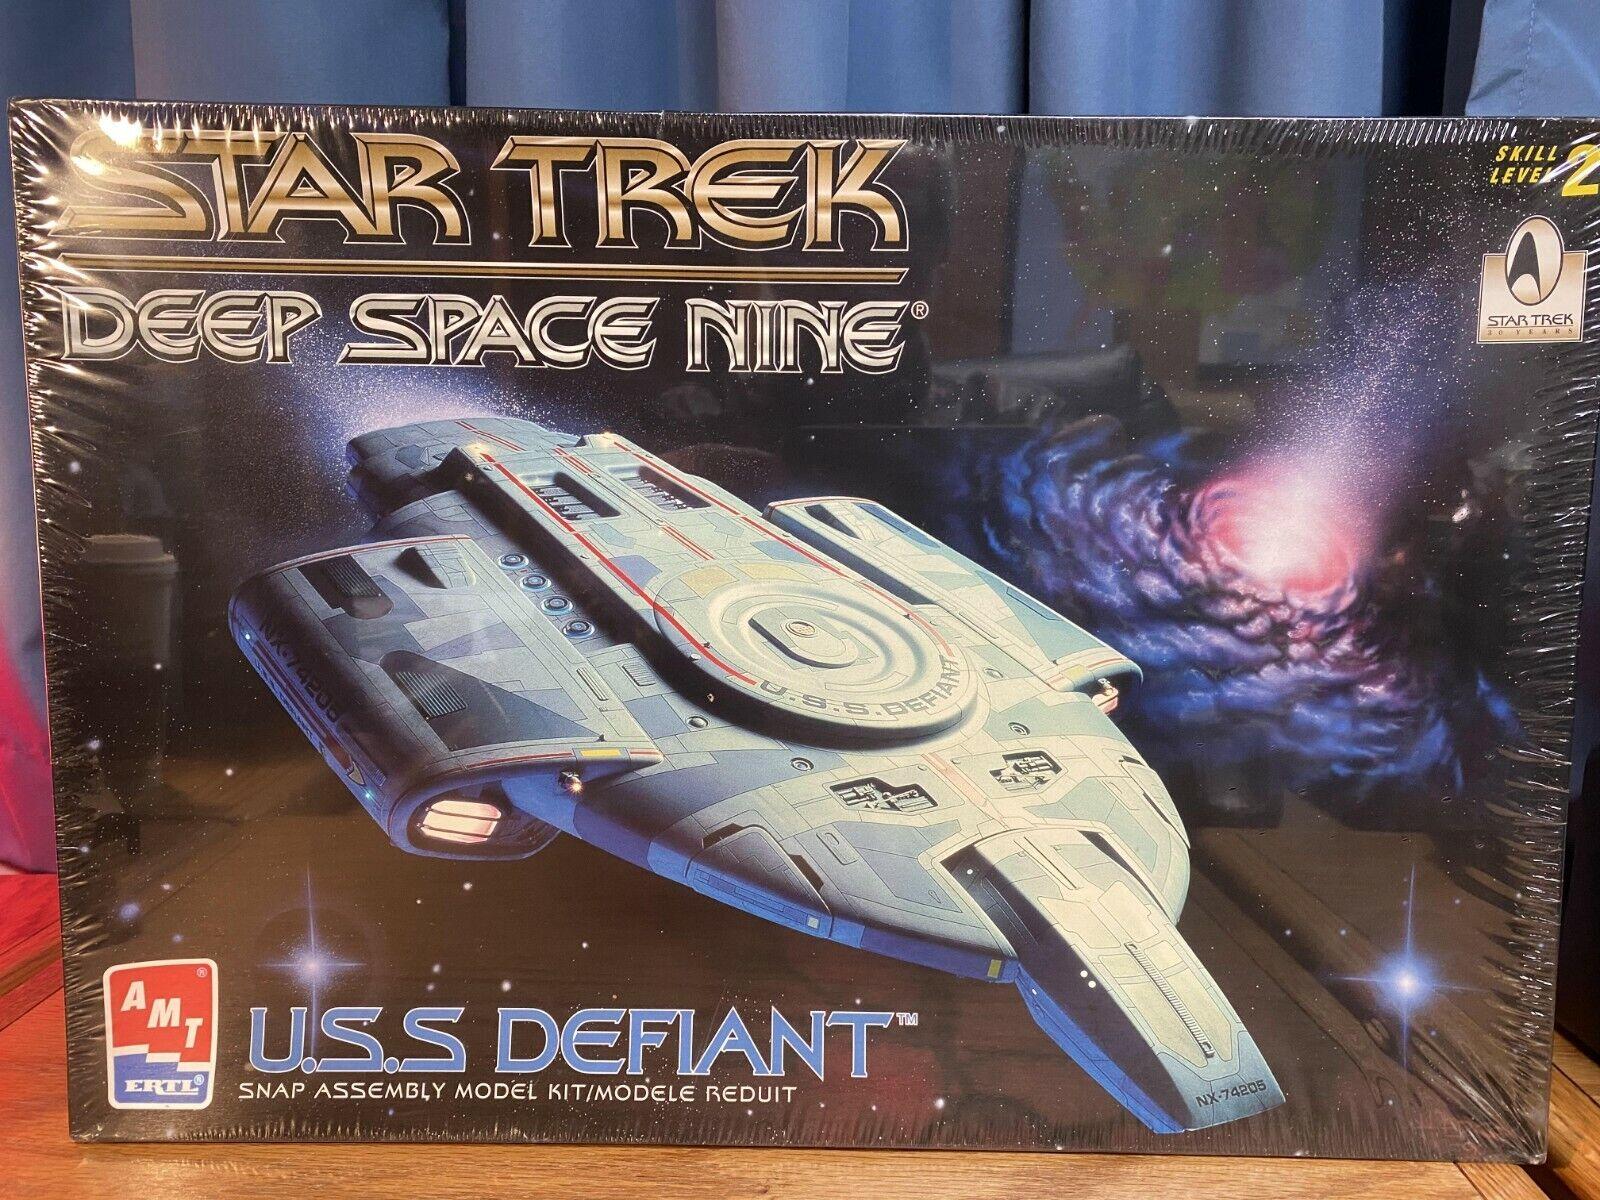 DS9 COMPLETE SET OF 277 INCLUDING U.S.S STAR TREK CCG DEEP SPACE NINE DEFIANT